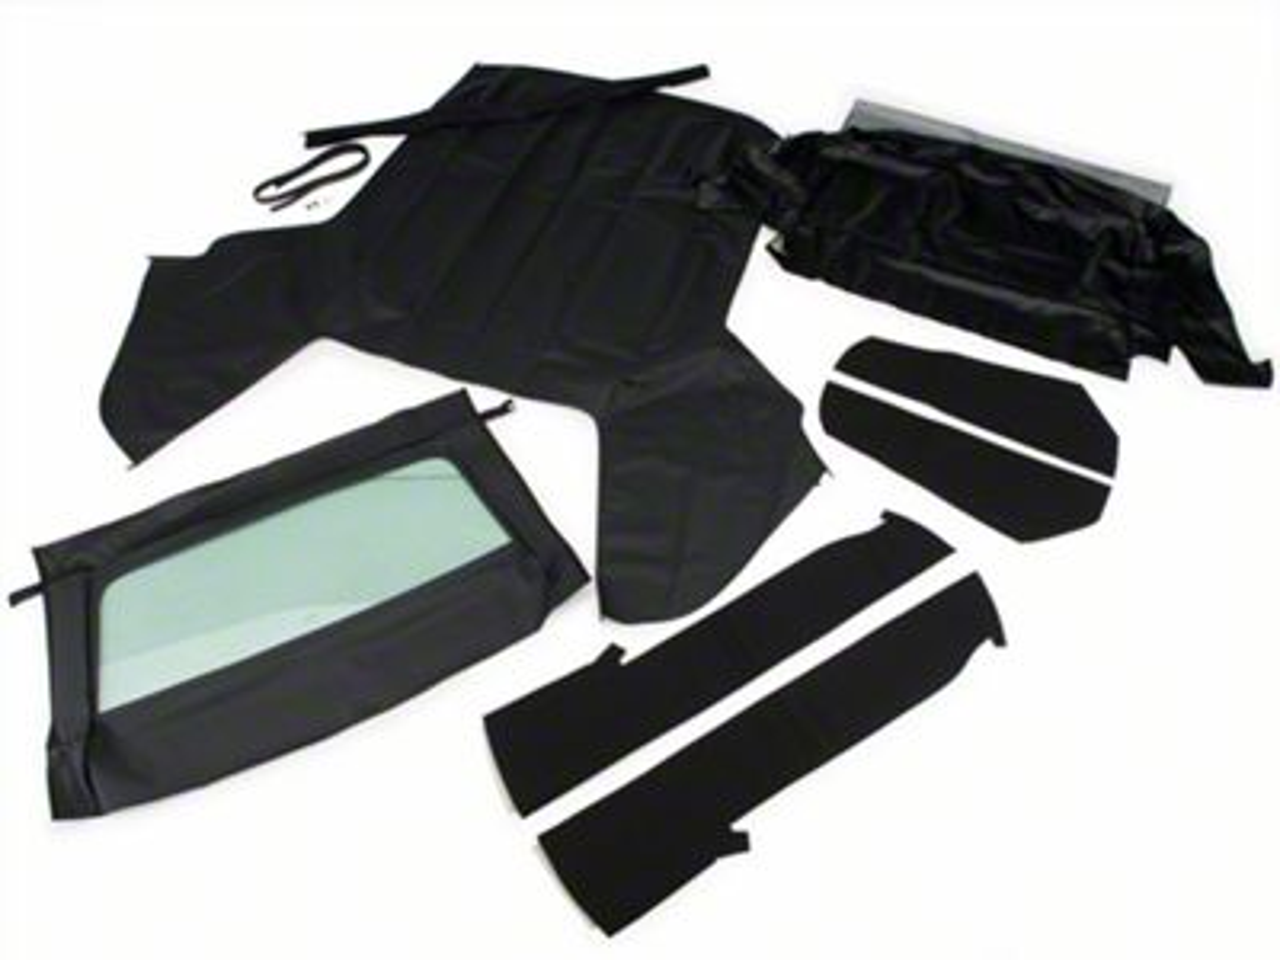 OPR Convertible Top Kit - Black (83-90 Convertible)